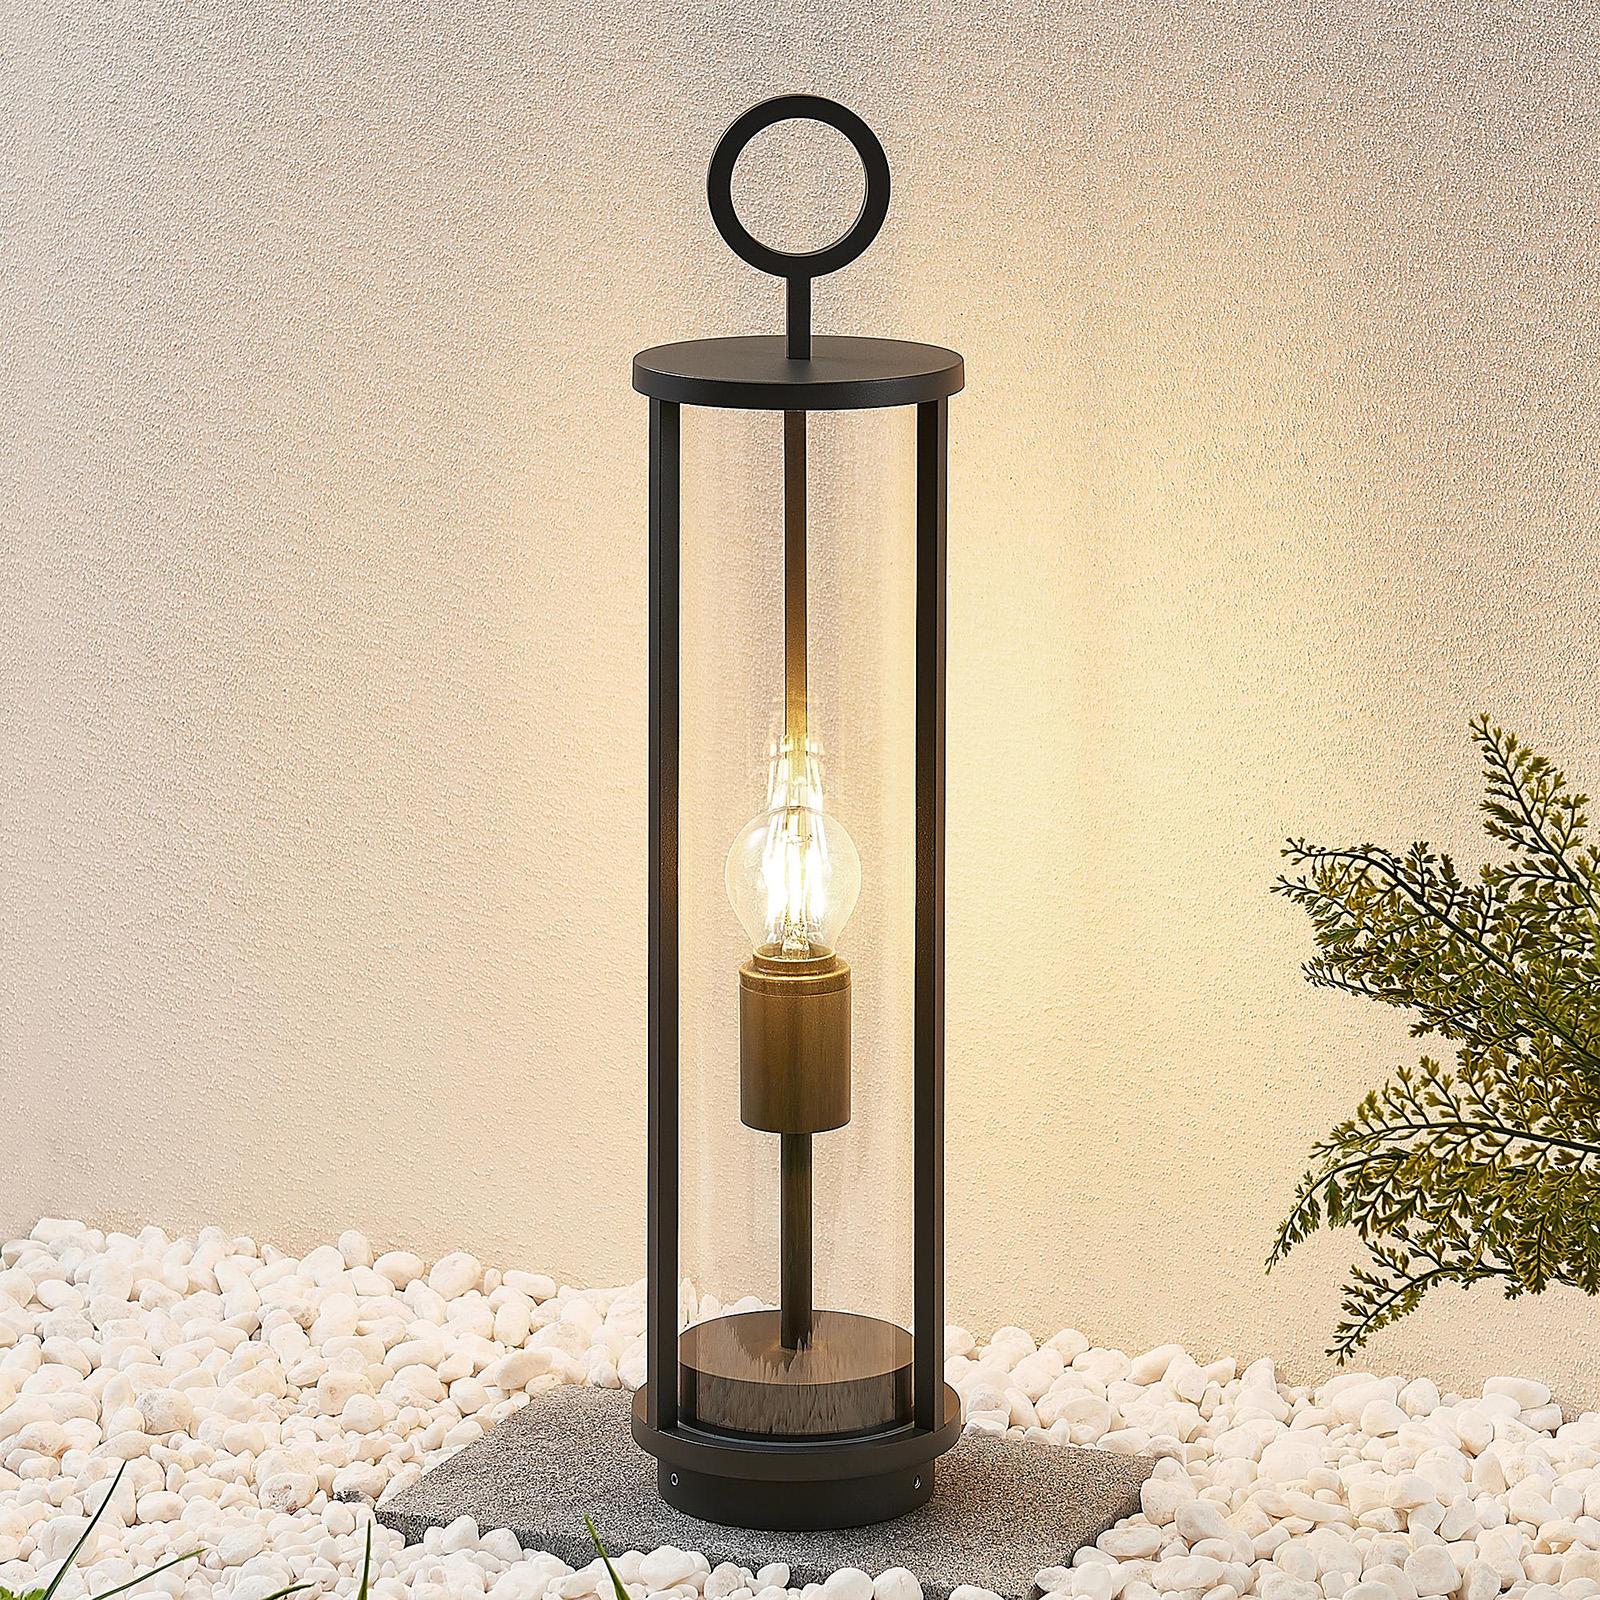 Lucande Emmeline lampioncino, 50 cm